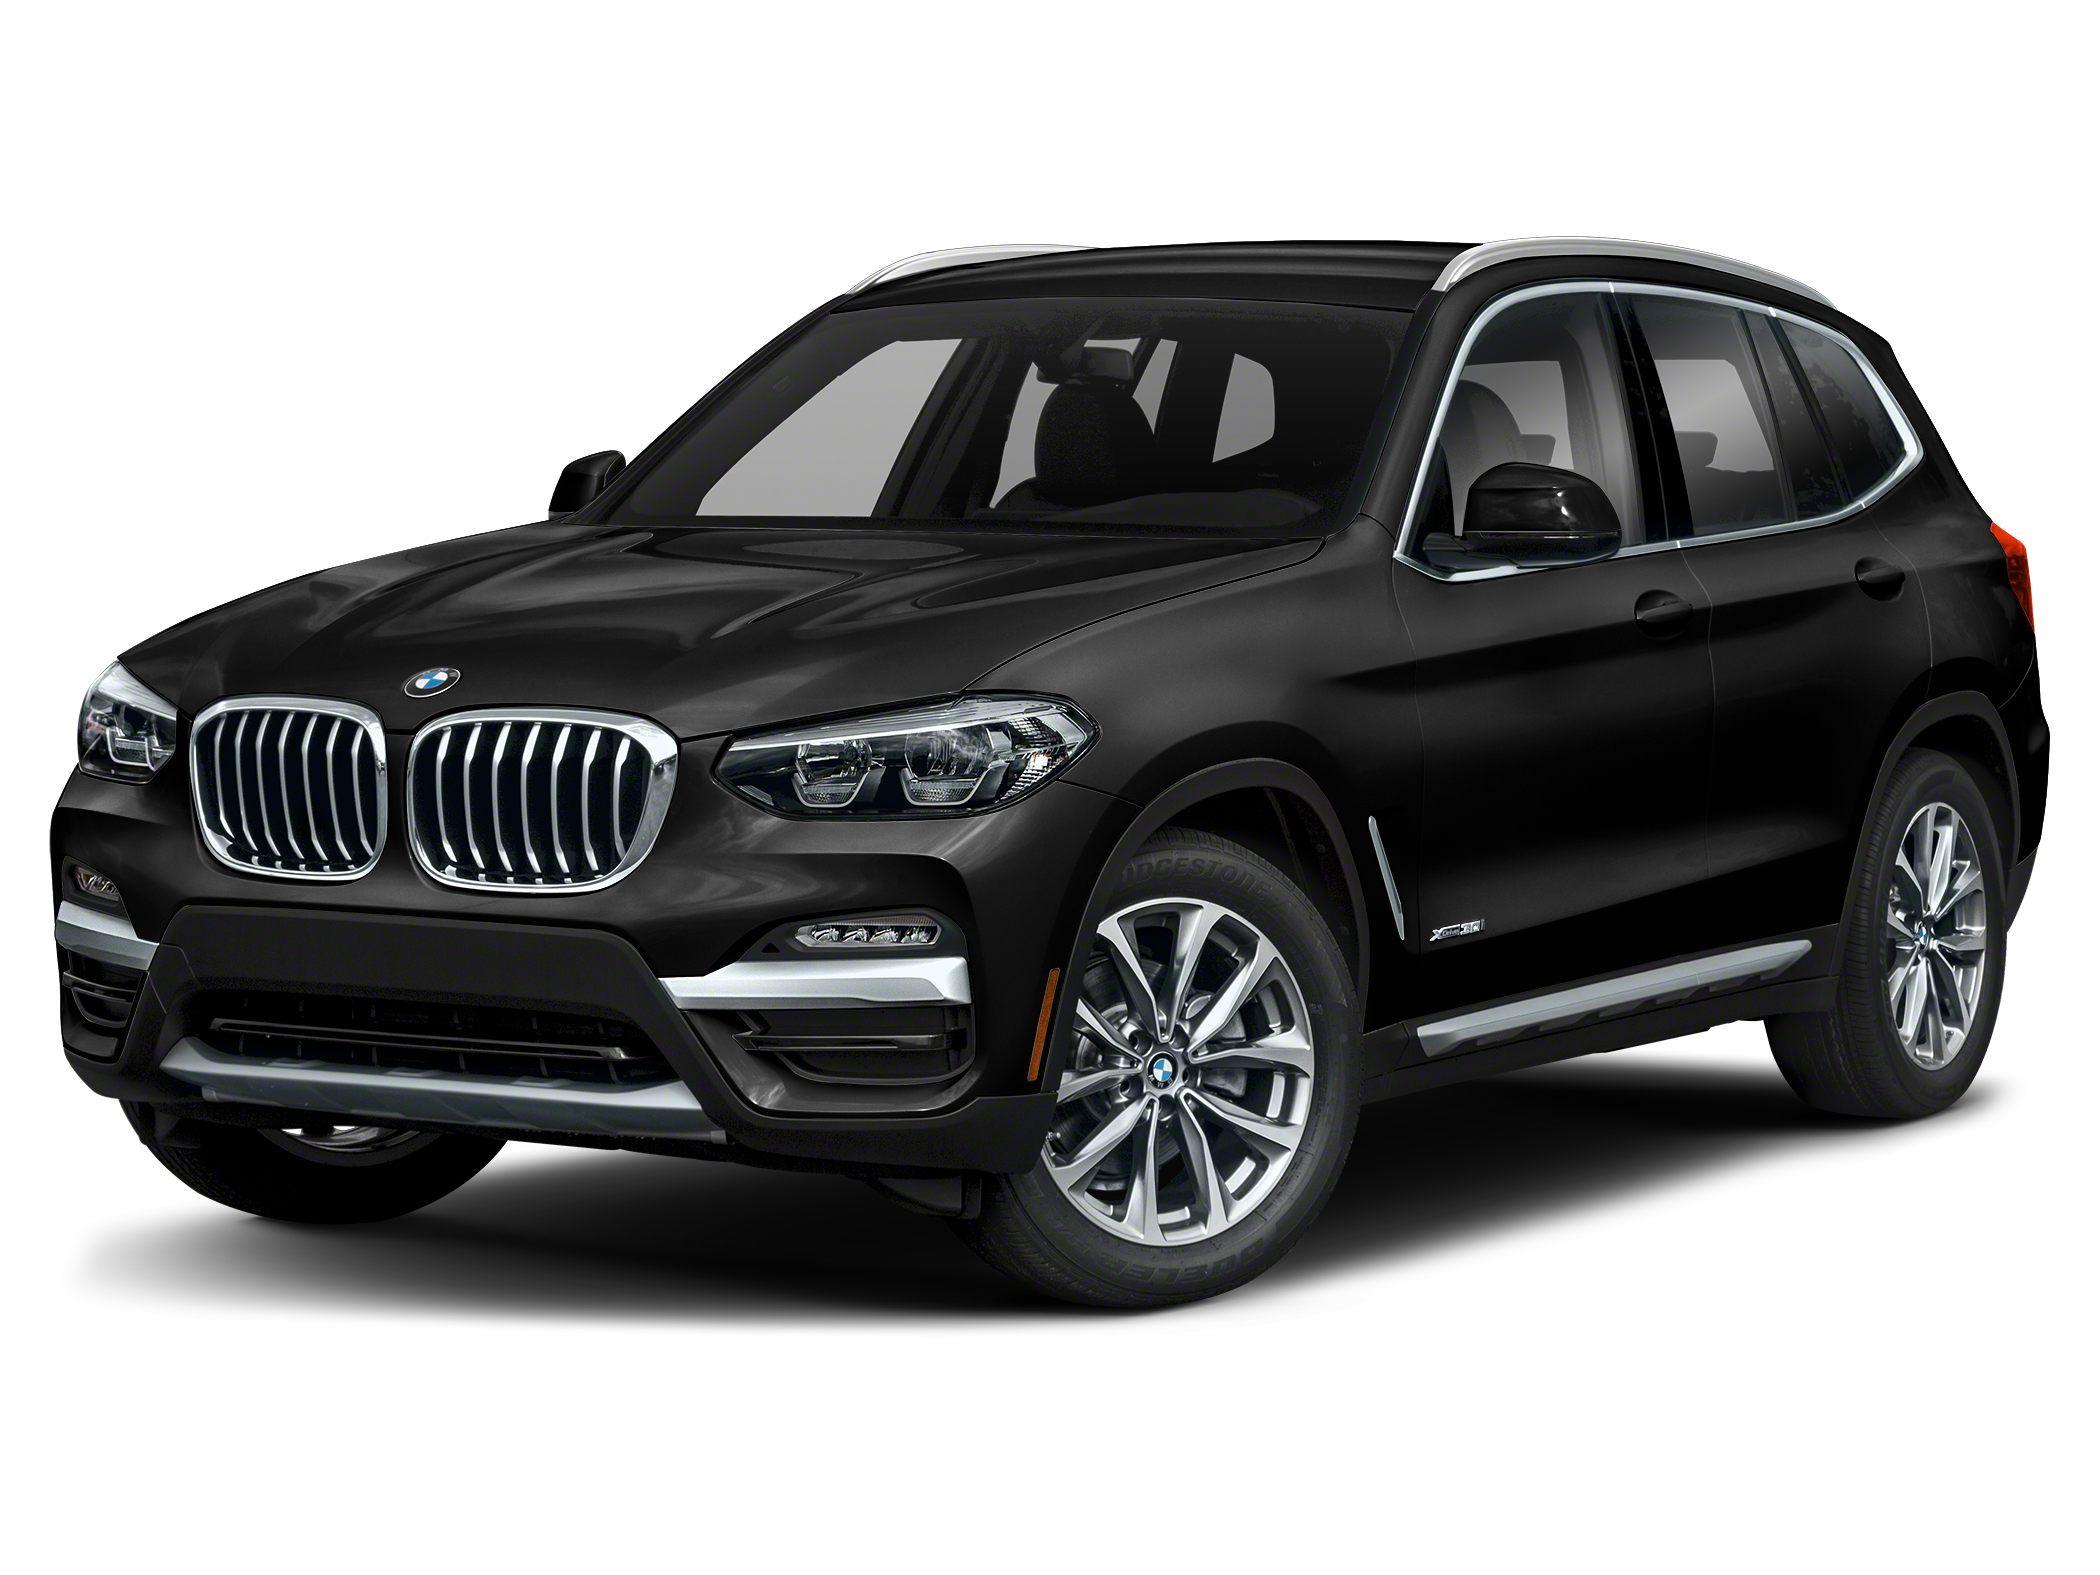 2021 BMW X3 M40i Sports Activity Vehicle